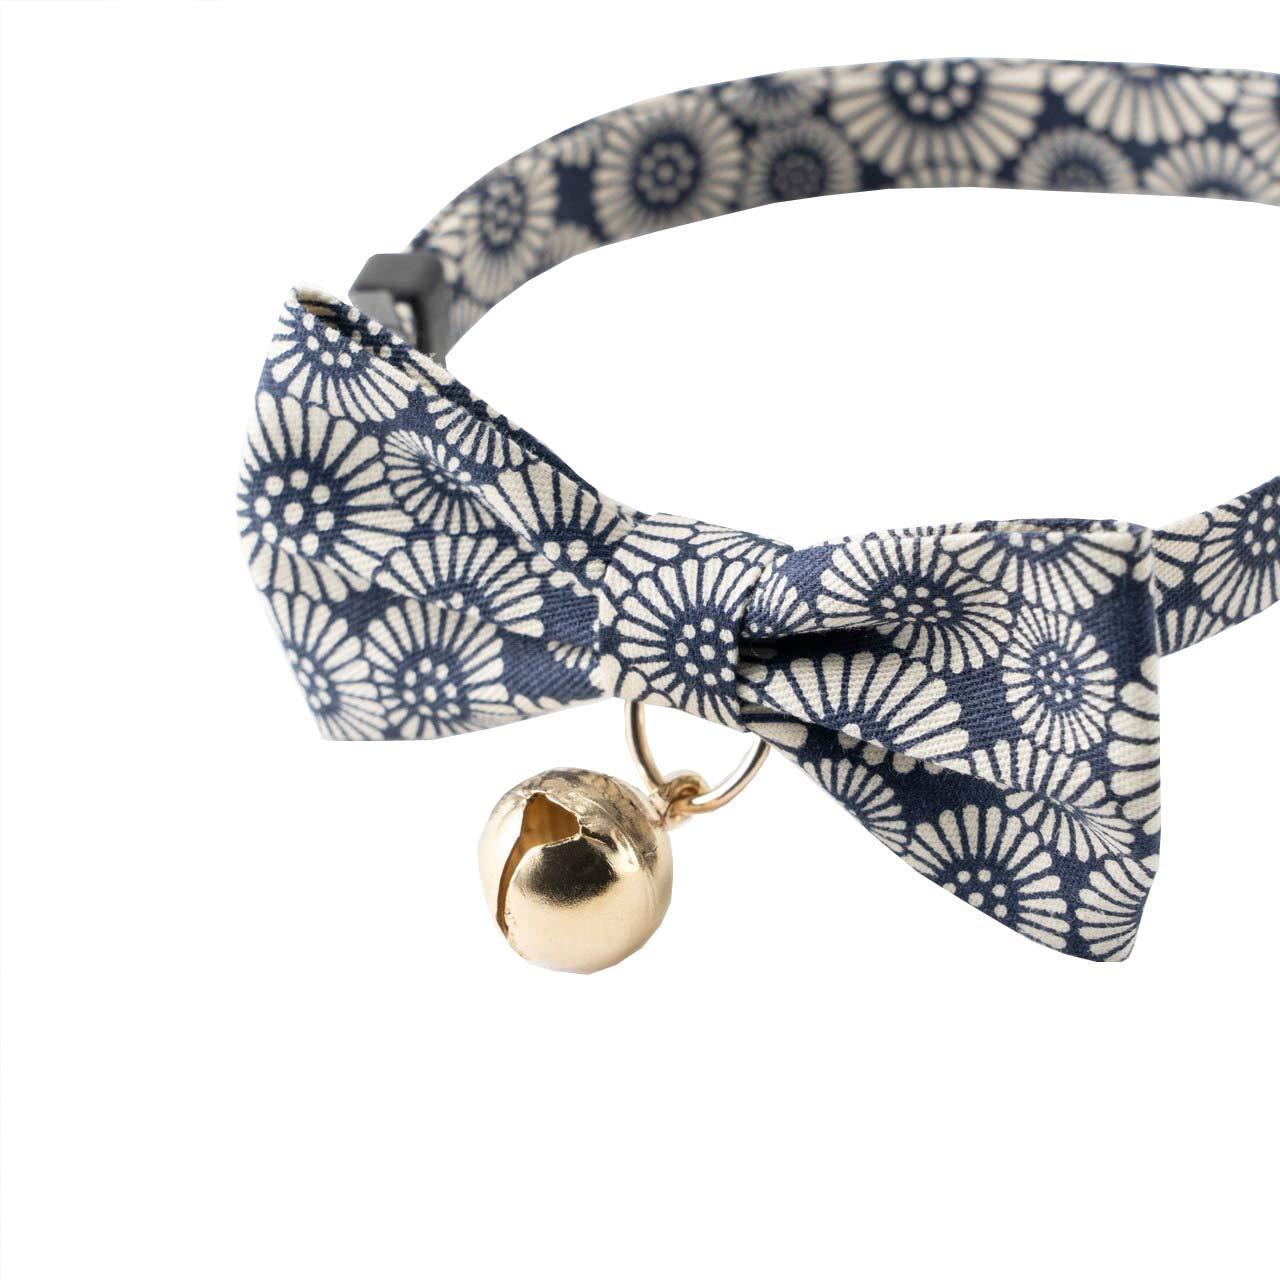 Necoichi Kiku Ribbon Bow Tie Cat Collar (Navy) by Necoichi